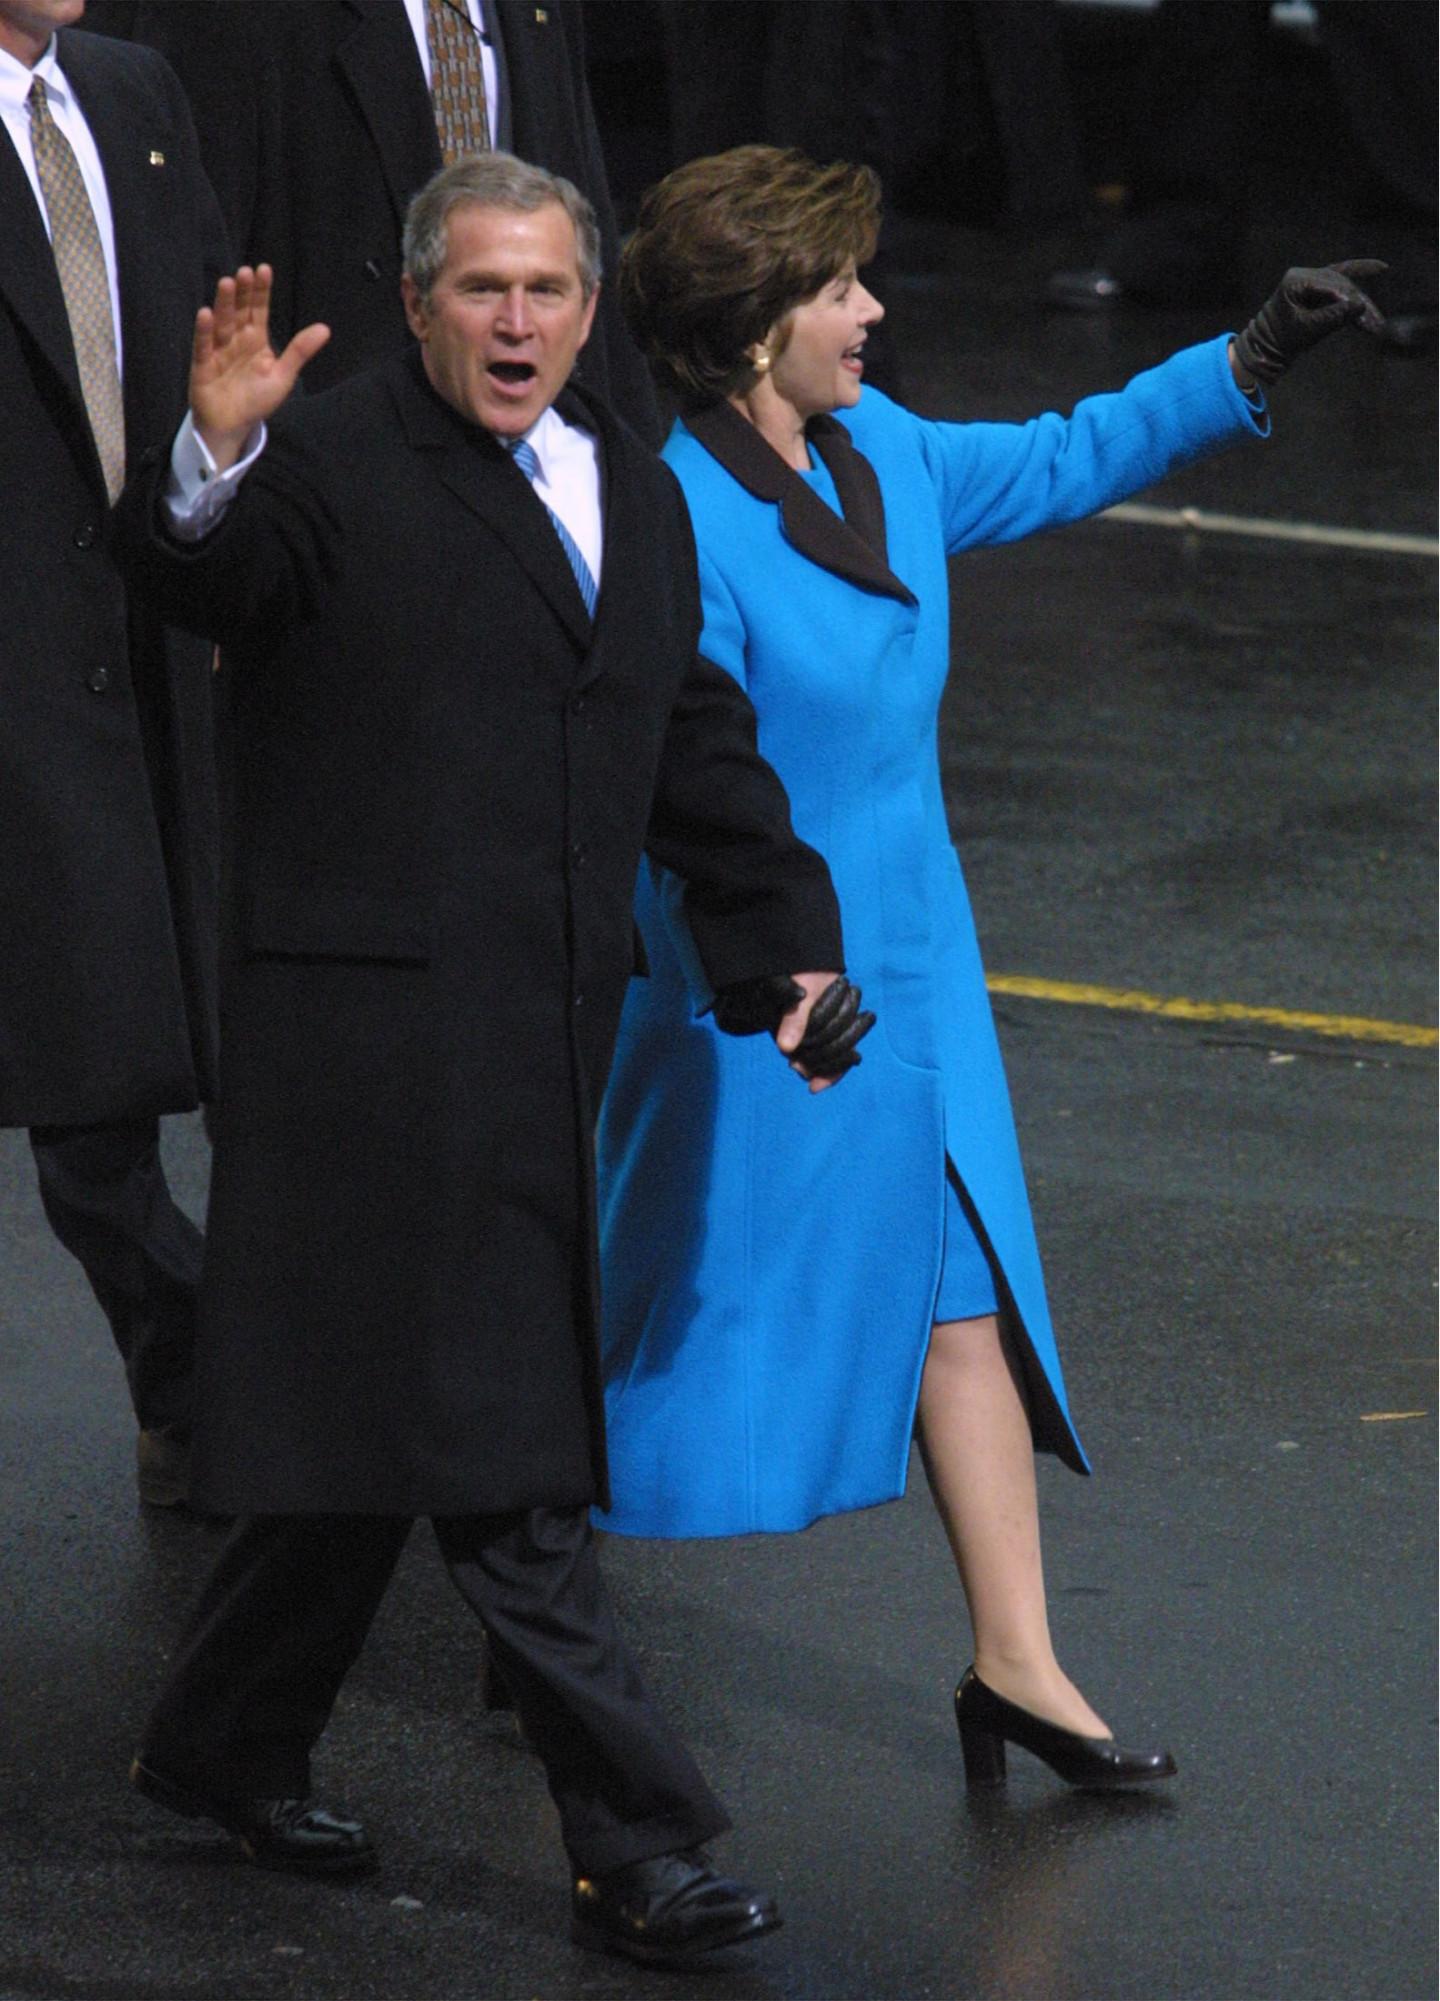 Джордж и Лора Буш, инаугурационный парад, 2001 год